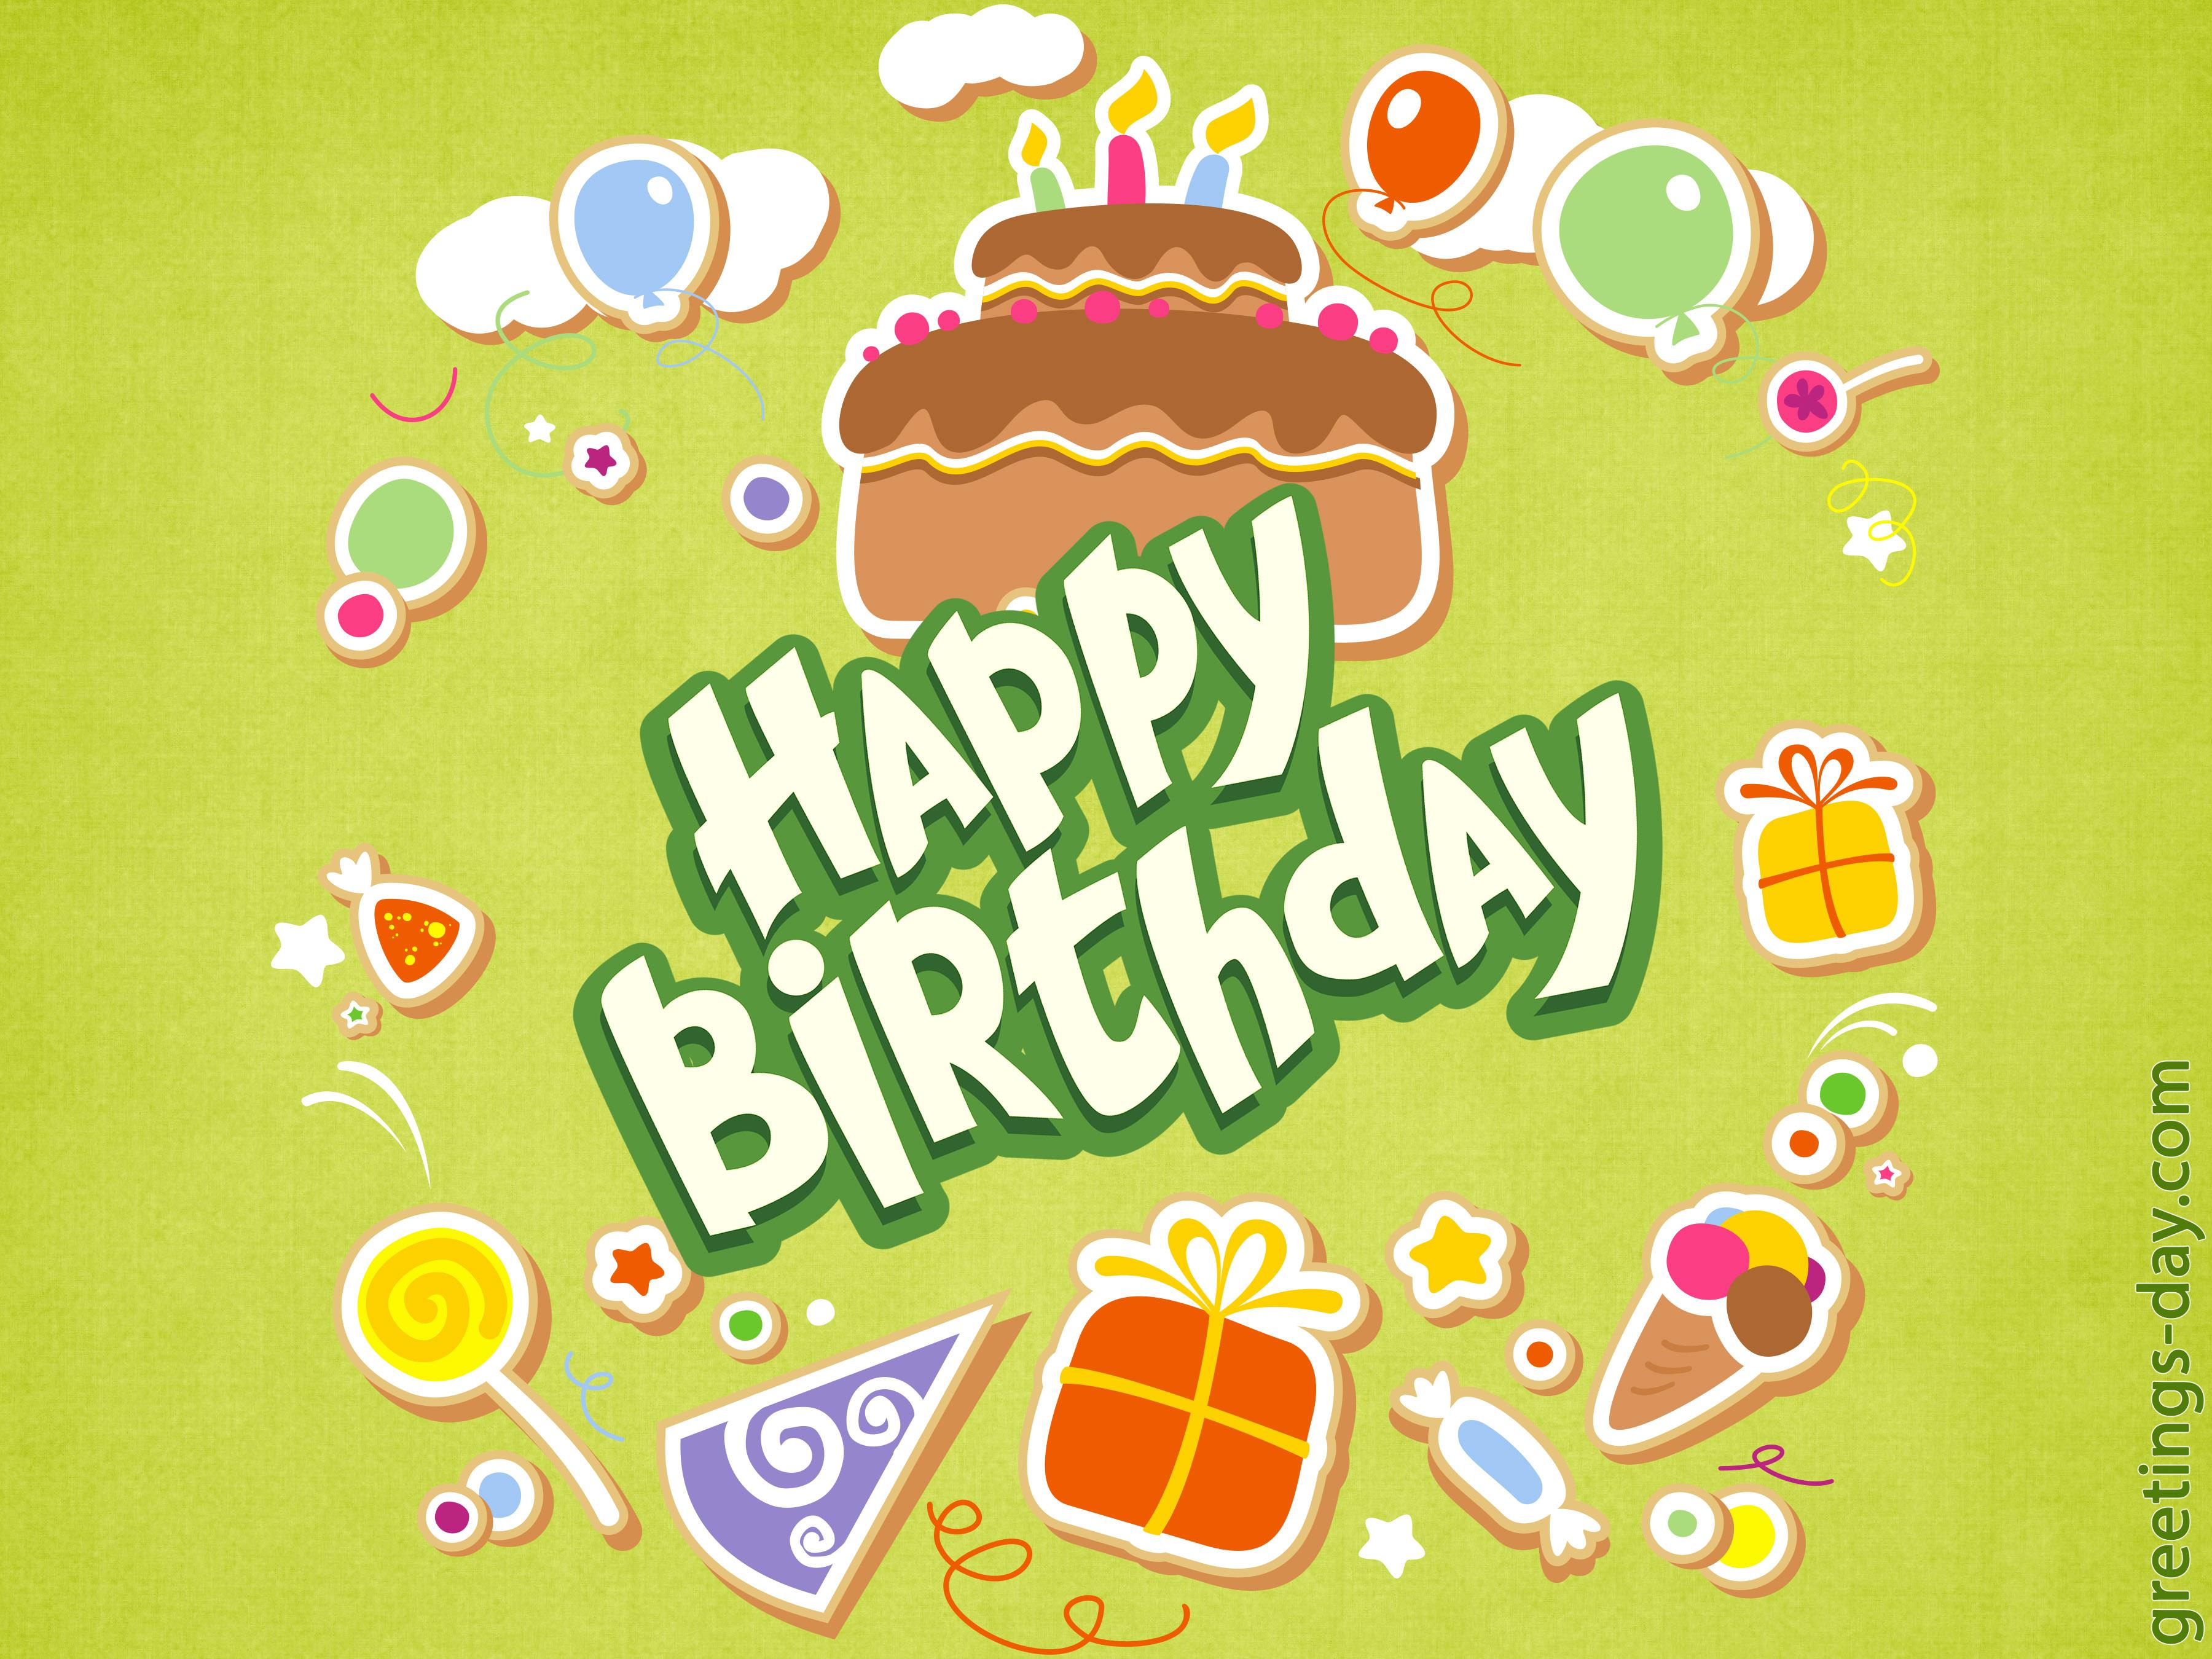 Happy Birthday card 23 06 06 ⋆ Greeting Cards Animated